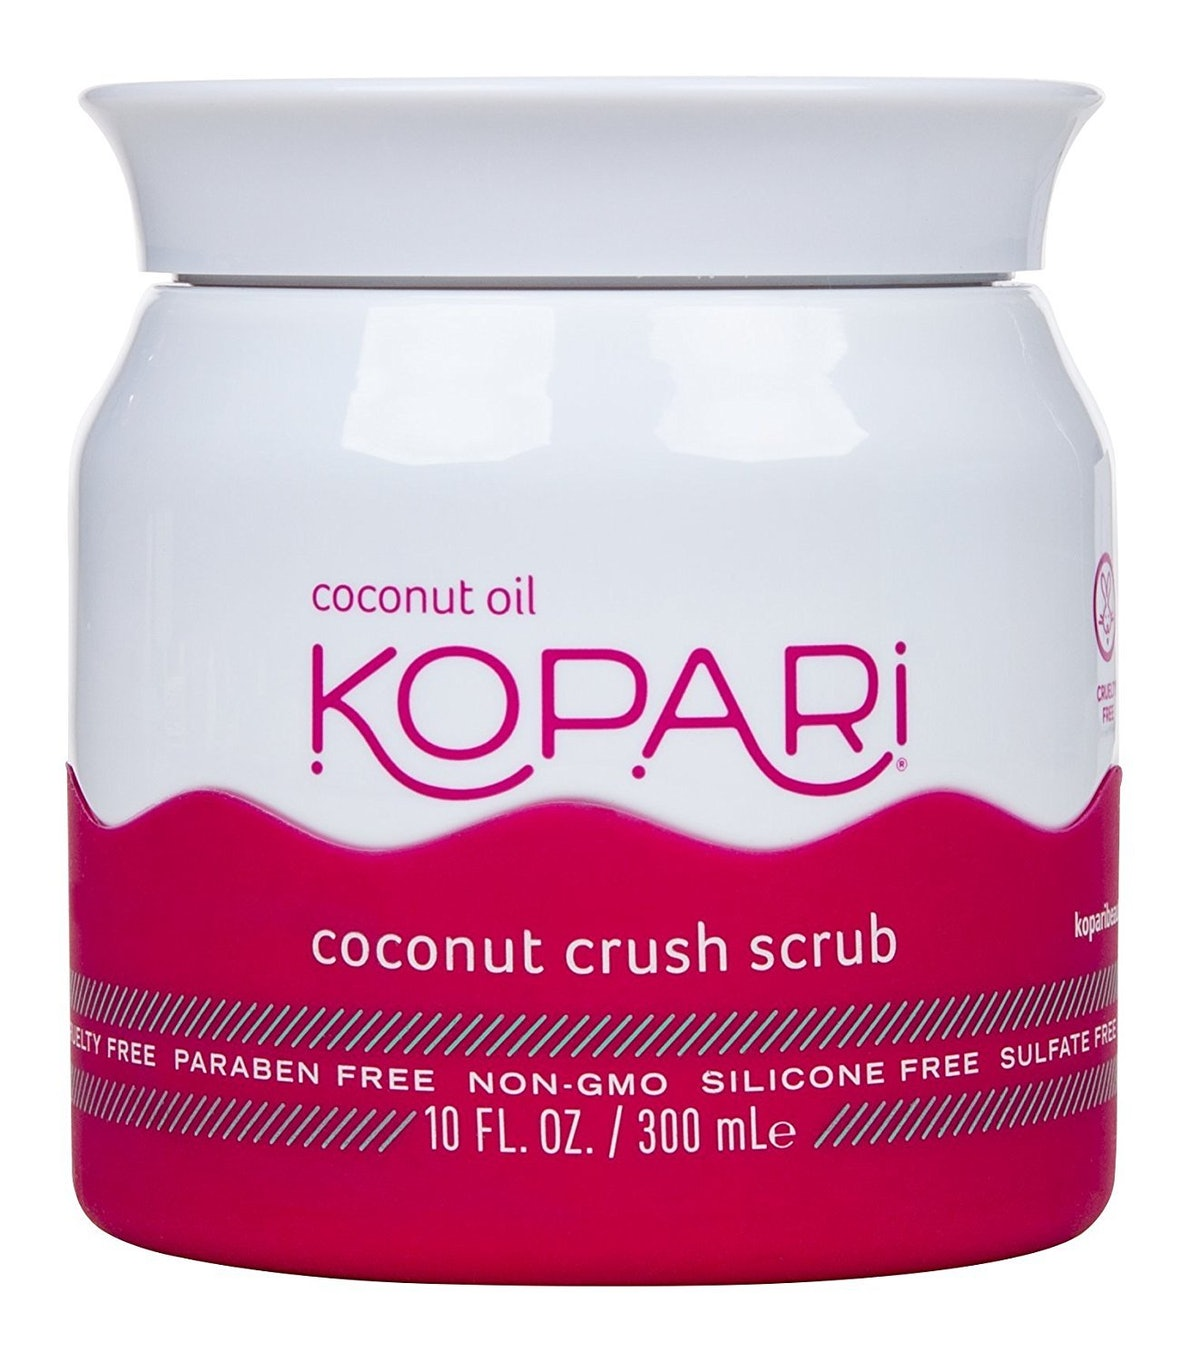 Kopari Beauty Coconut Crush Scrub